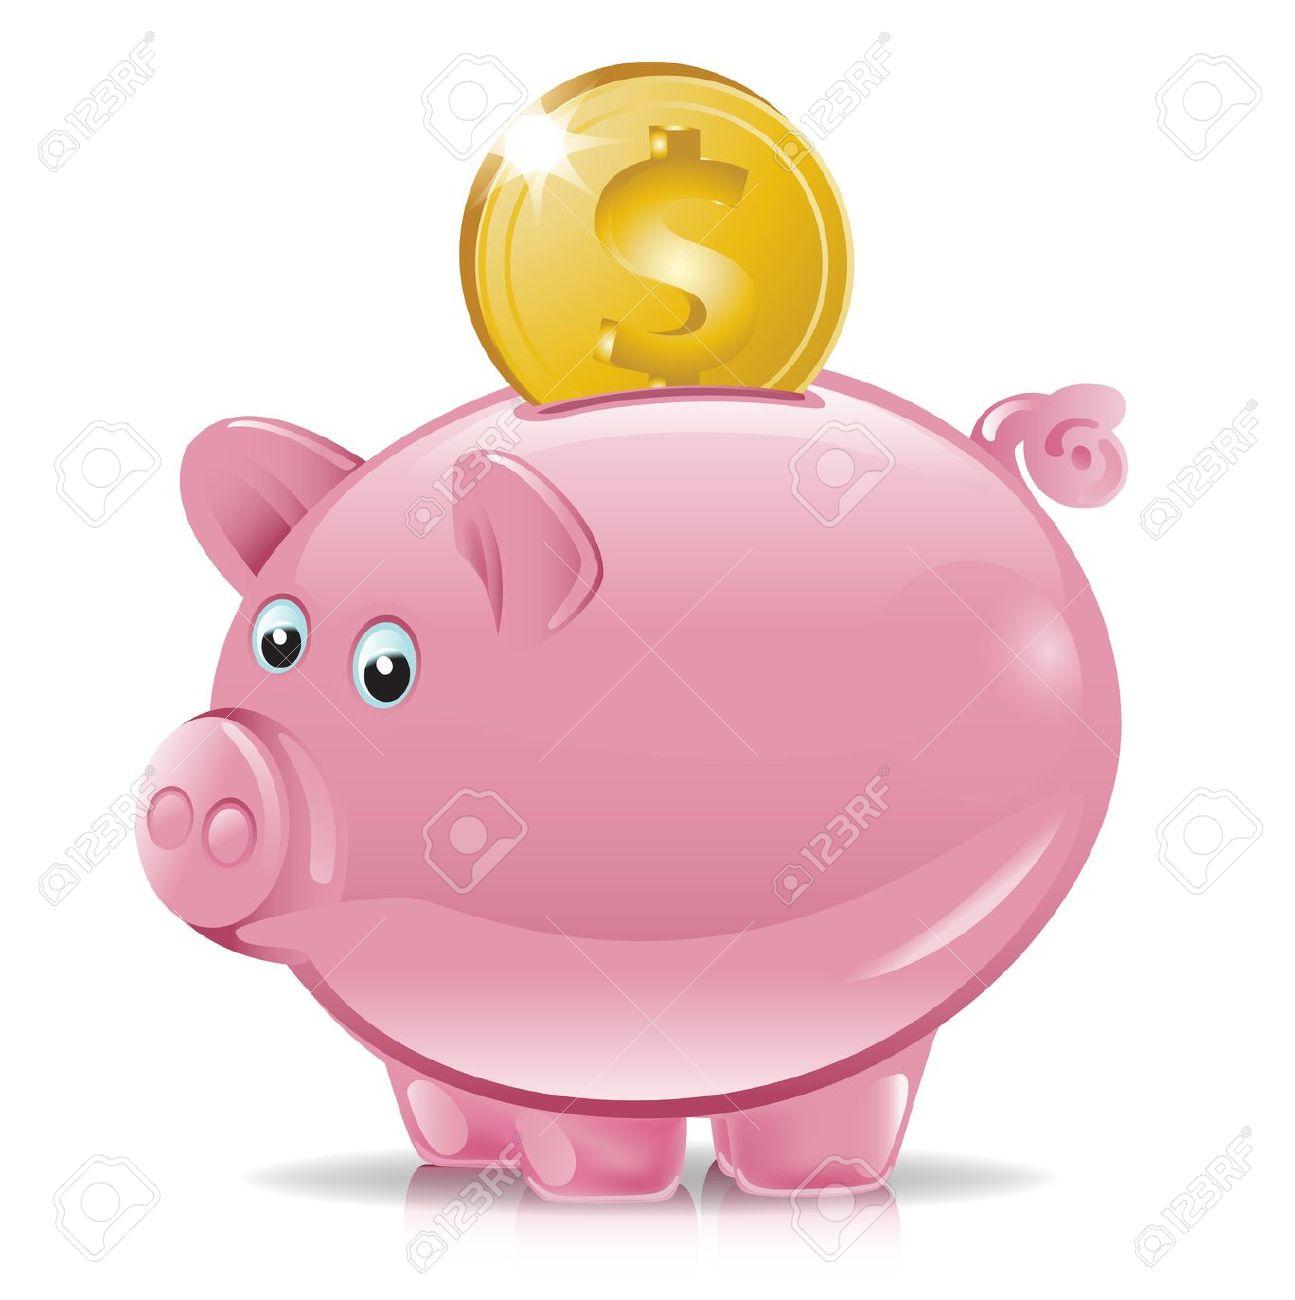 Cute piggy bank clipart clip freeuse Cute piggy banks clipart - ClipartFest clip freeuse